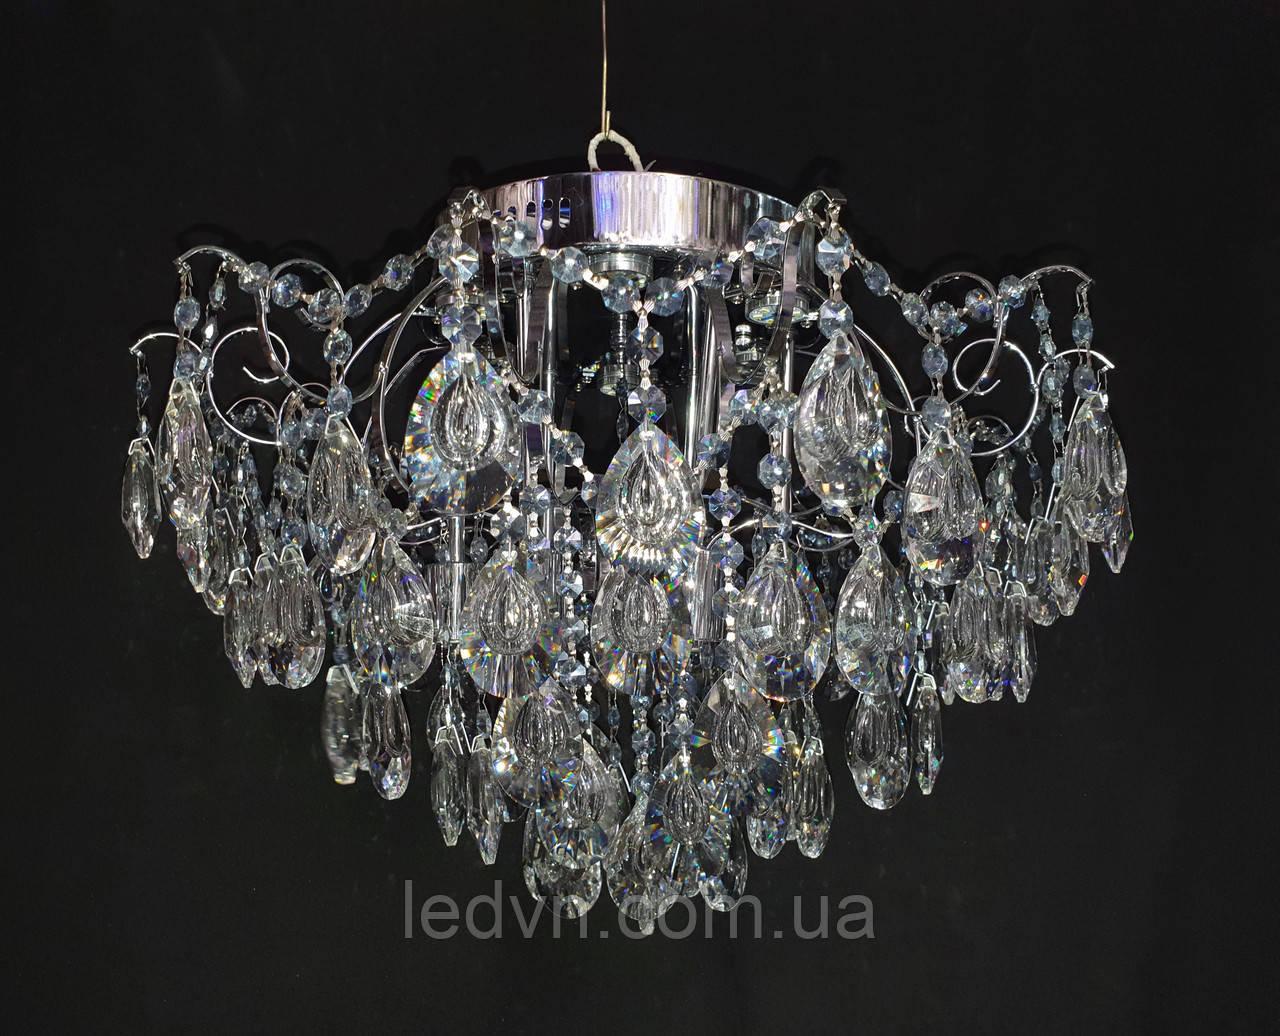 Хрустальная люстра классичесская с LED подсветкой на 6 лампочек серебро